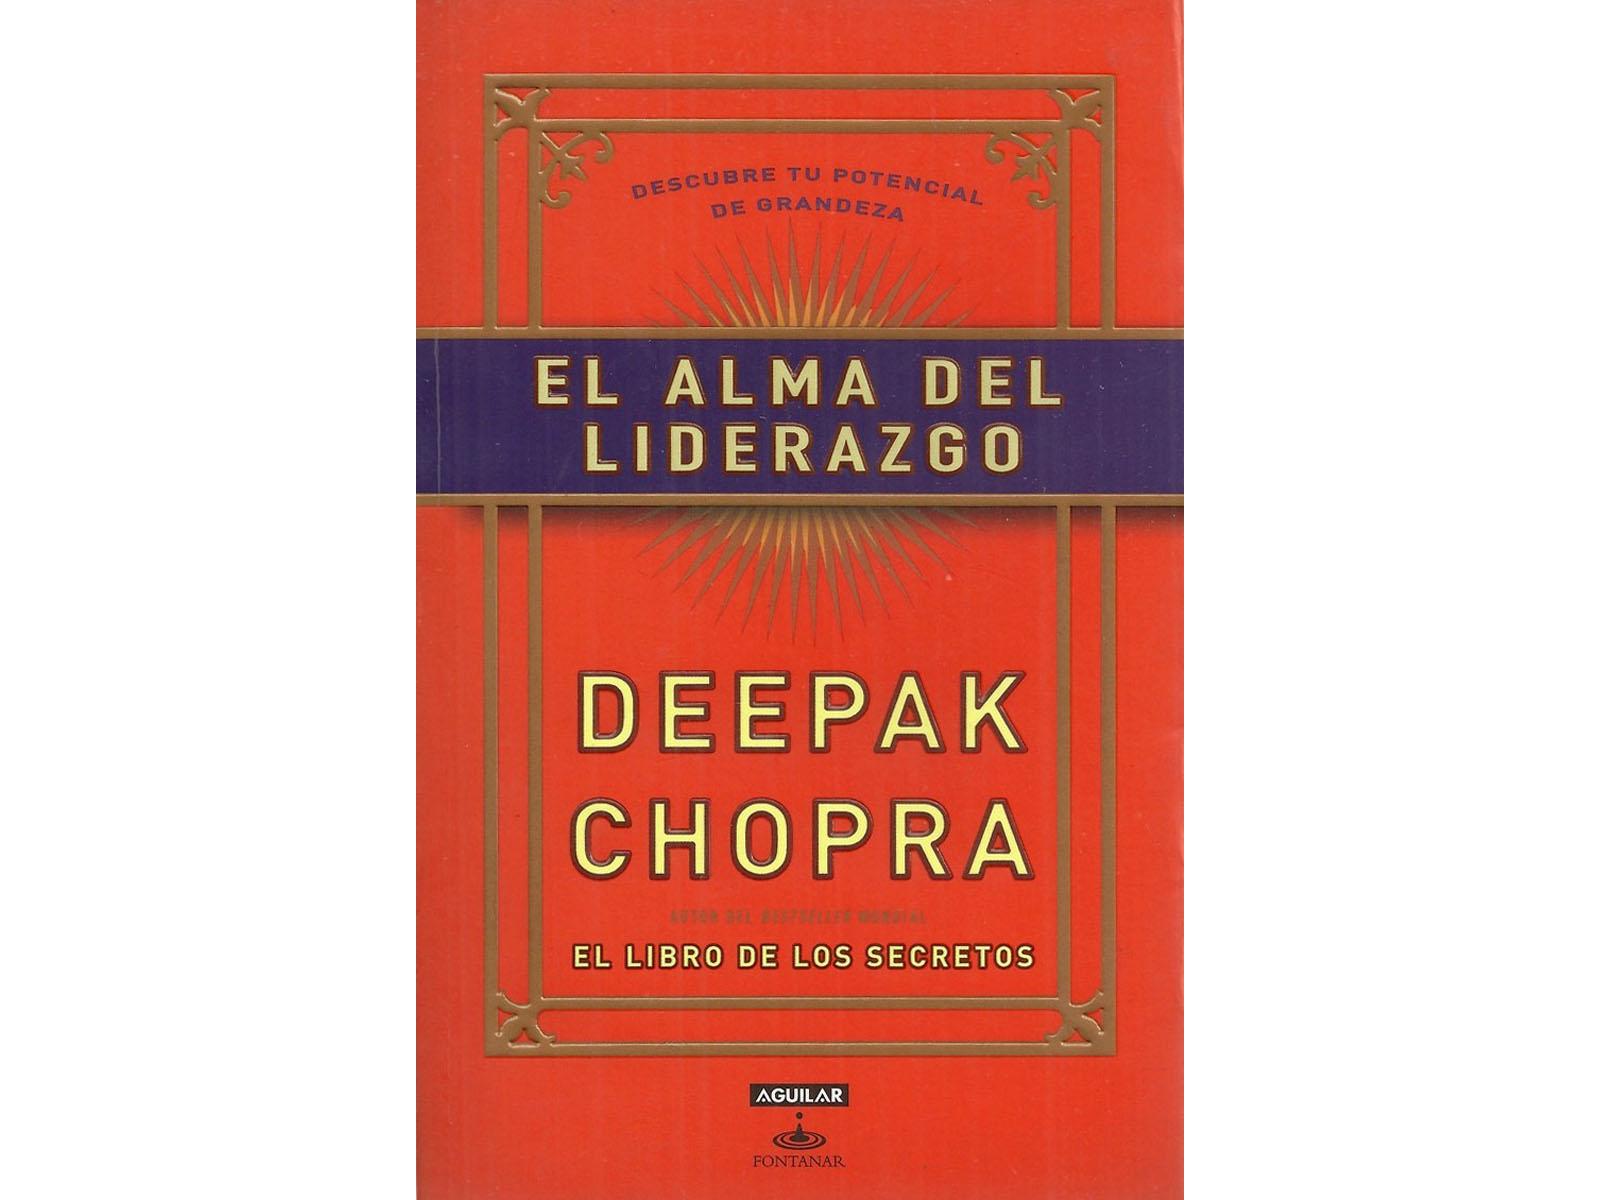 el-alma-del-liderazgo-deepak-chopra